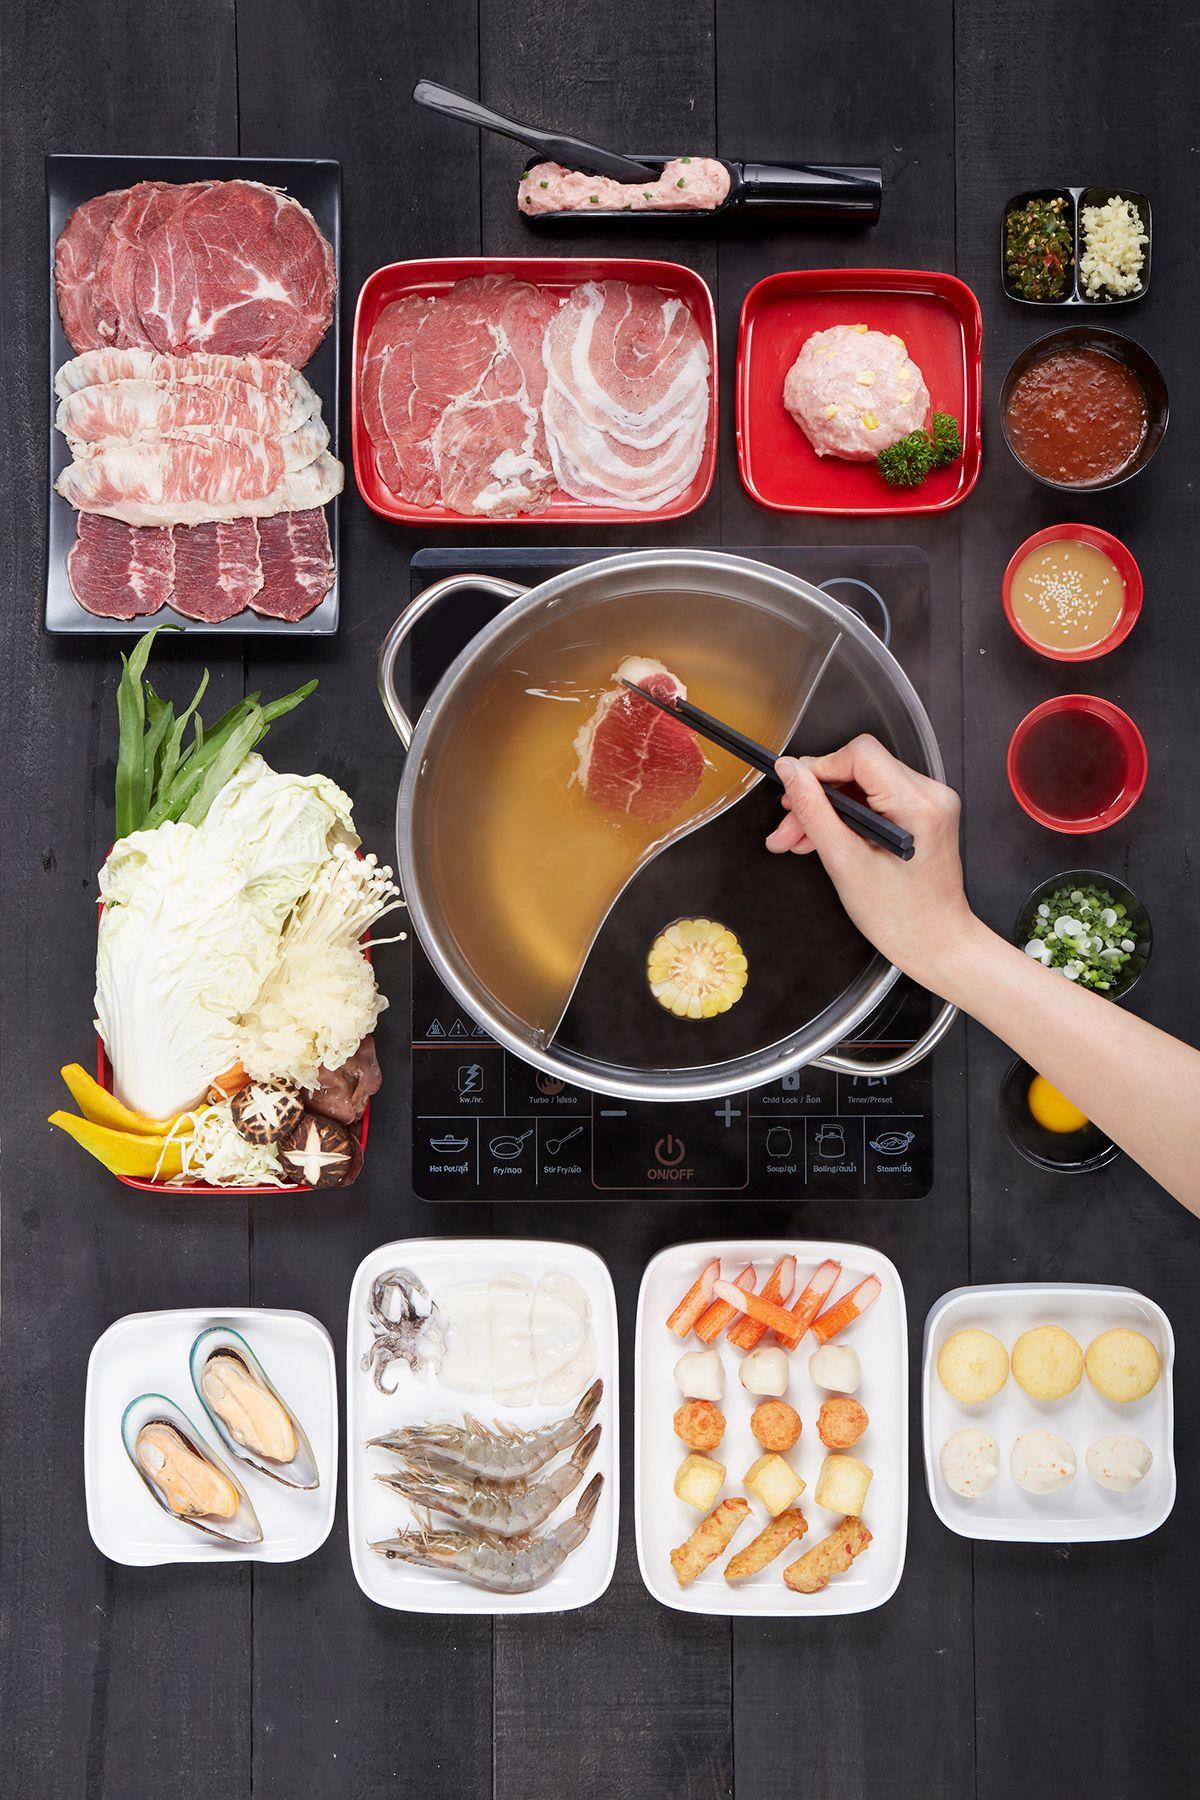 Pin Oleh Sairin J Di Japanese Food Resep Masakan Jepang Makanan Dan Minuman Makanan